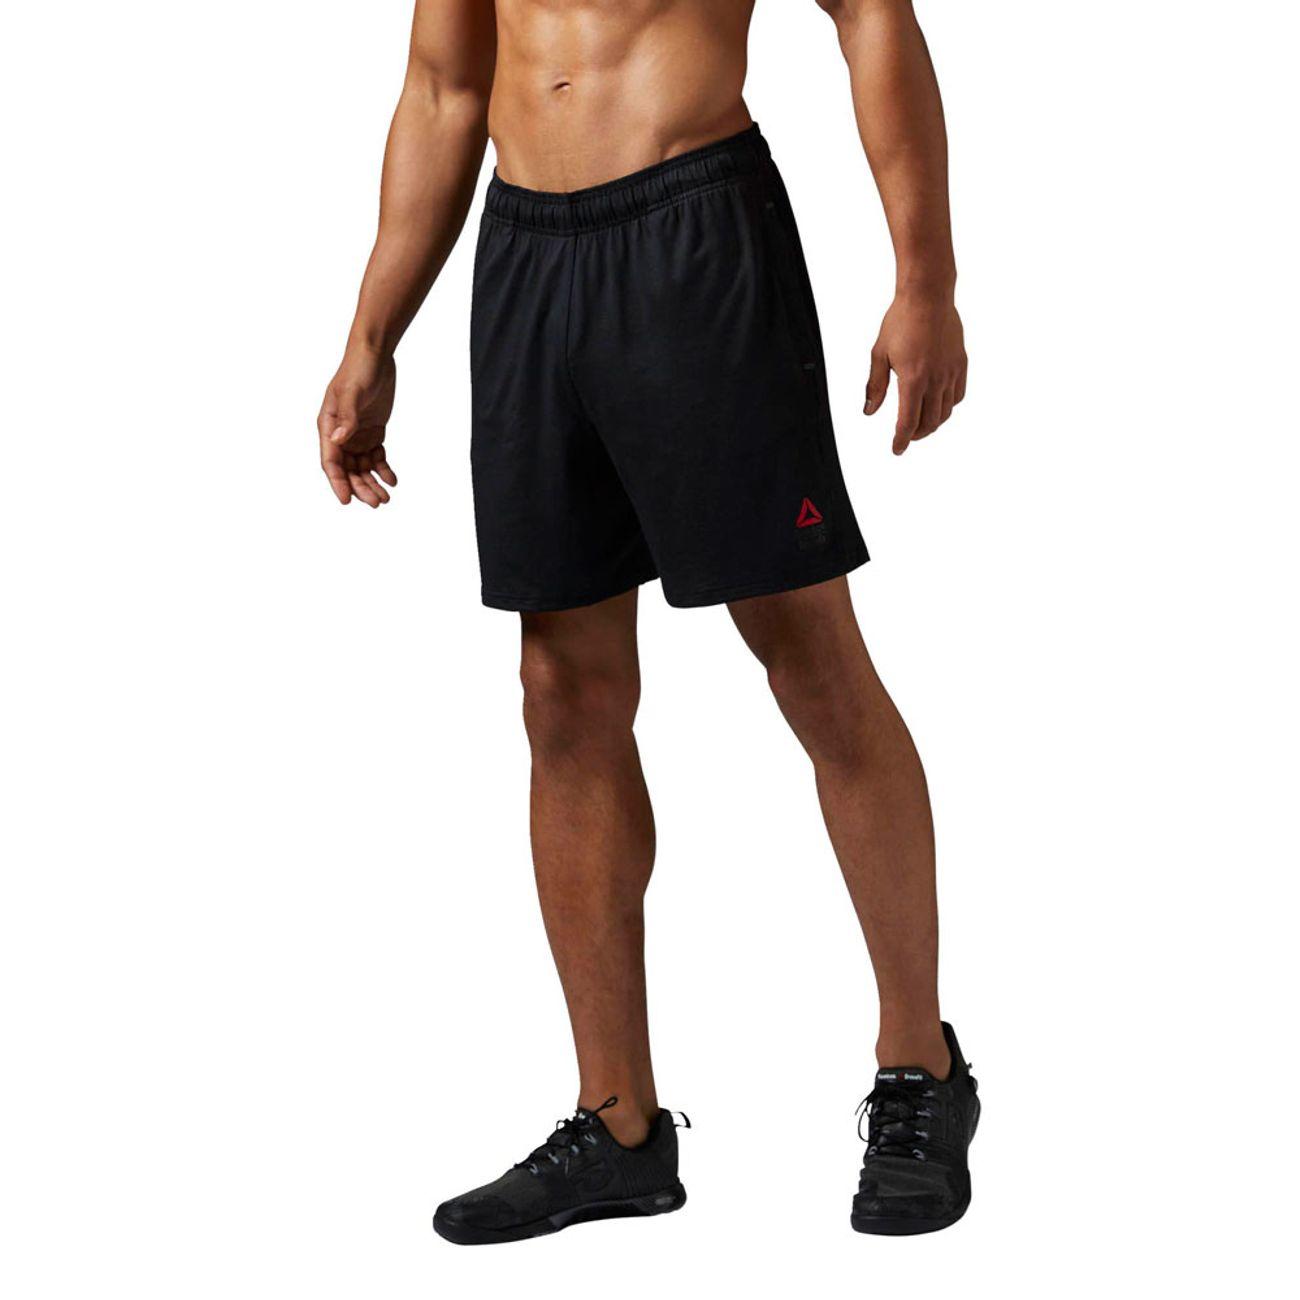 Reebok Crossfit Speedwick Ii Shorts – achat et prix pas cher - Go Sport 6d2e32aff13